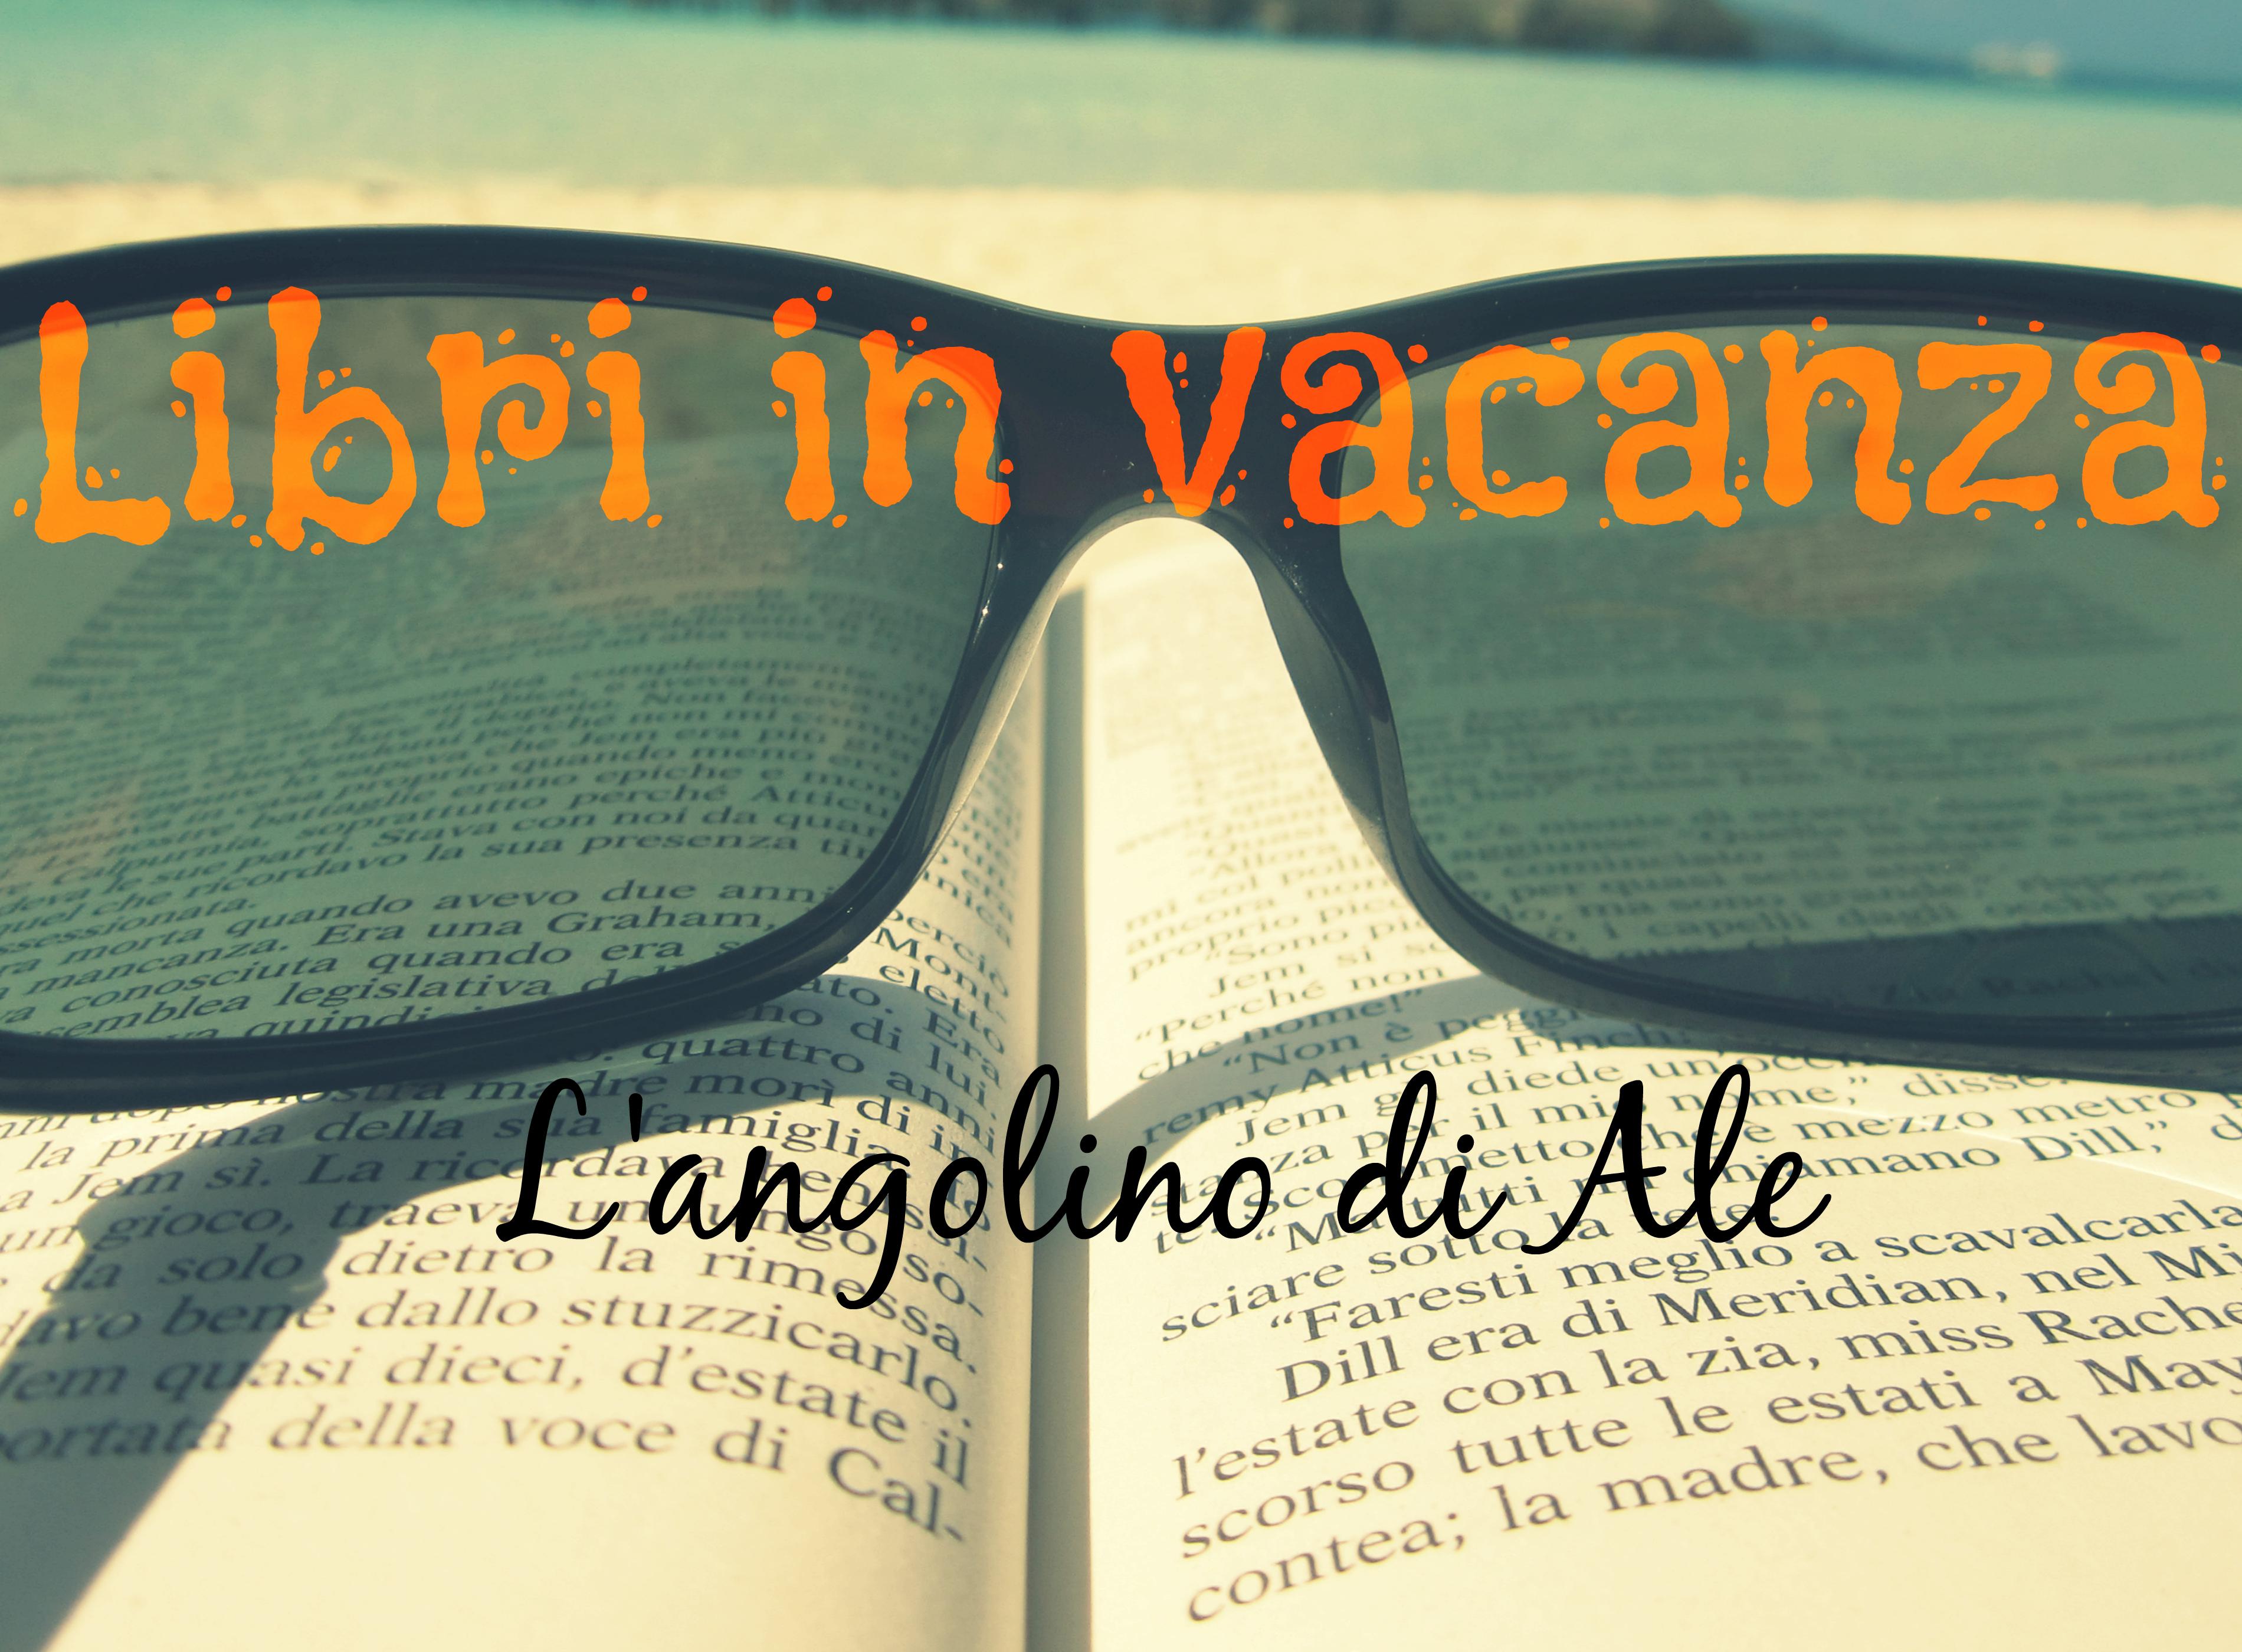 Libri in vacanza 2014